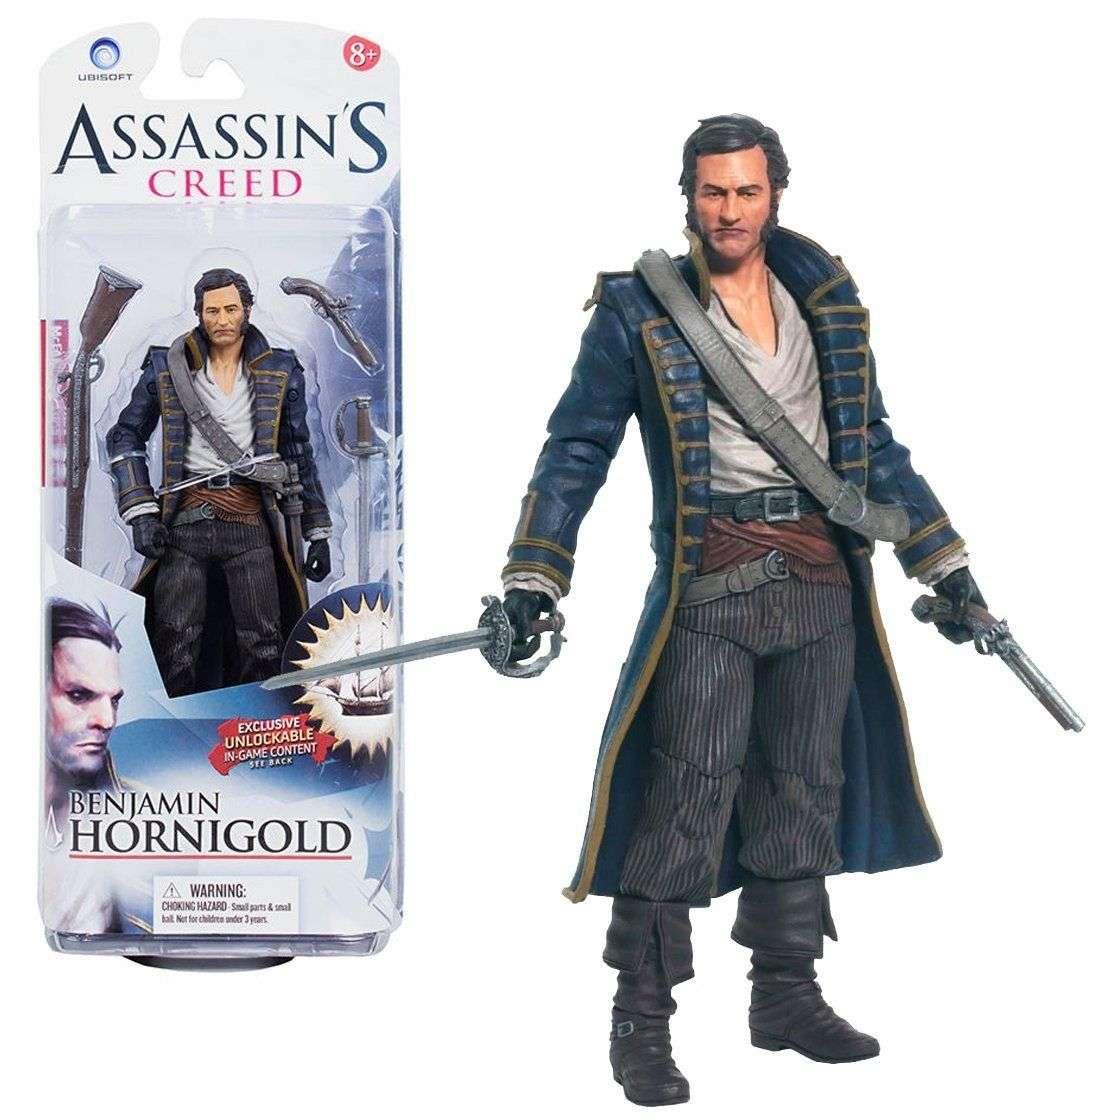 Action Figure: Assassin's Creed Series 1 - Benjamin Hornigold Photo